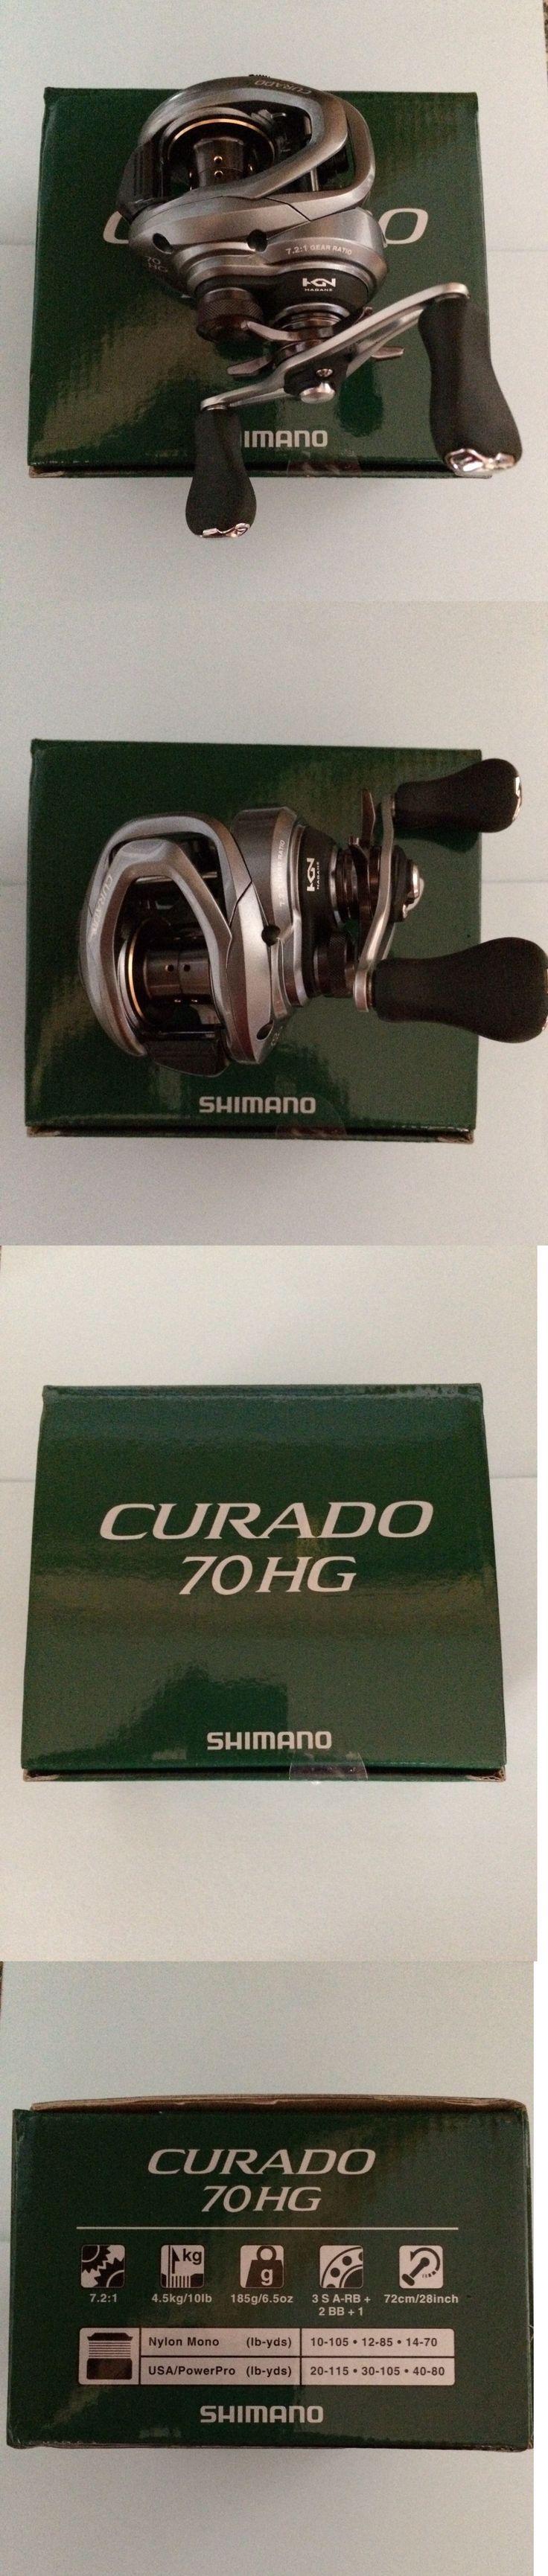 Baitcasting Reels 108153: Shimano Curado 7.2:1 Cu70hg Casting Fishing Reel -> BUY IT NOW ONLY: $159.95 on eBay!